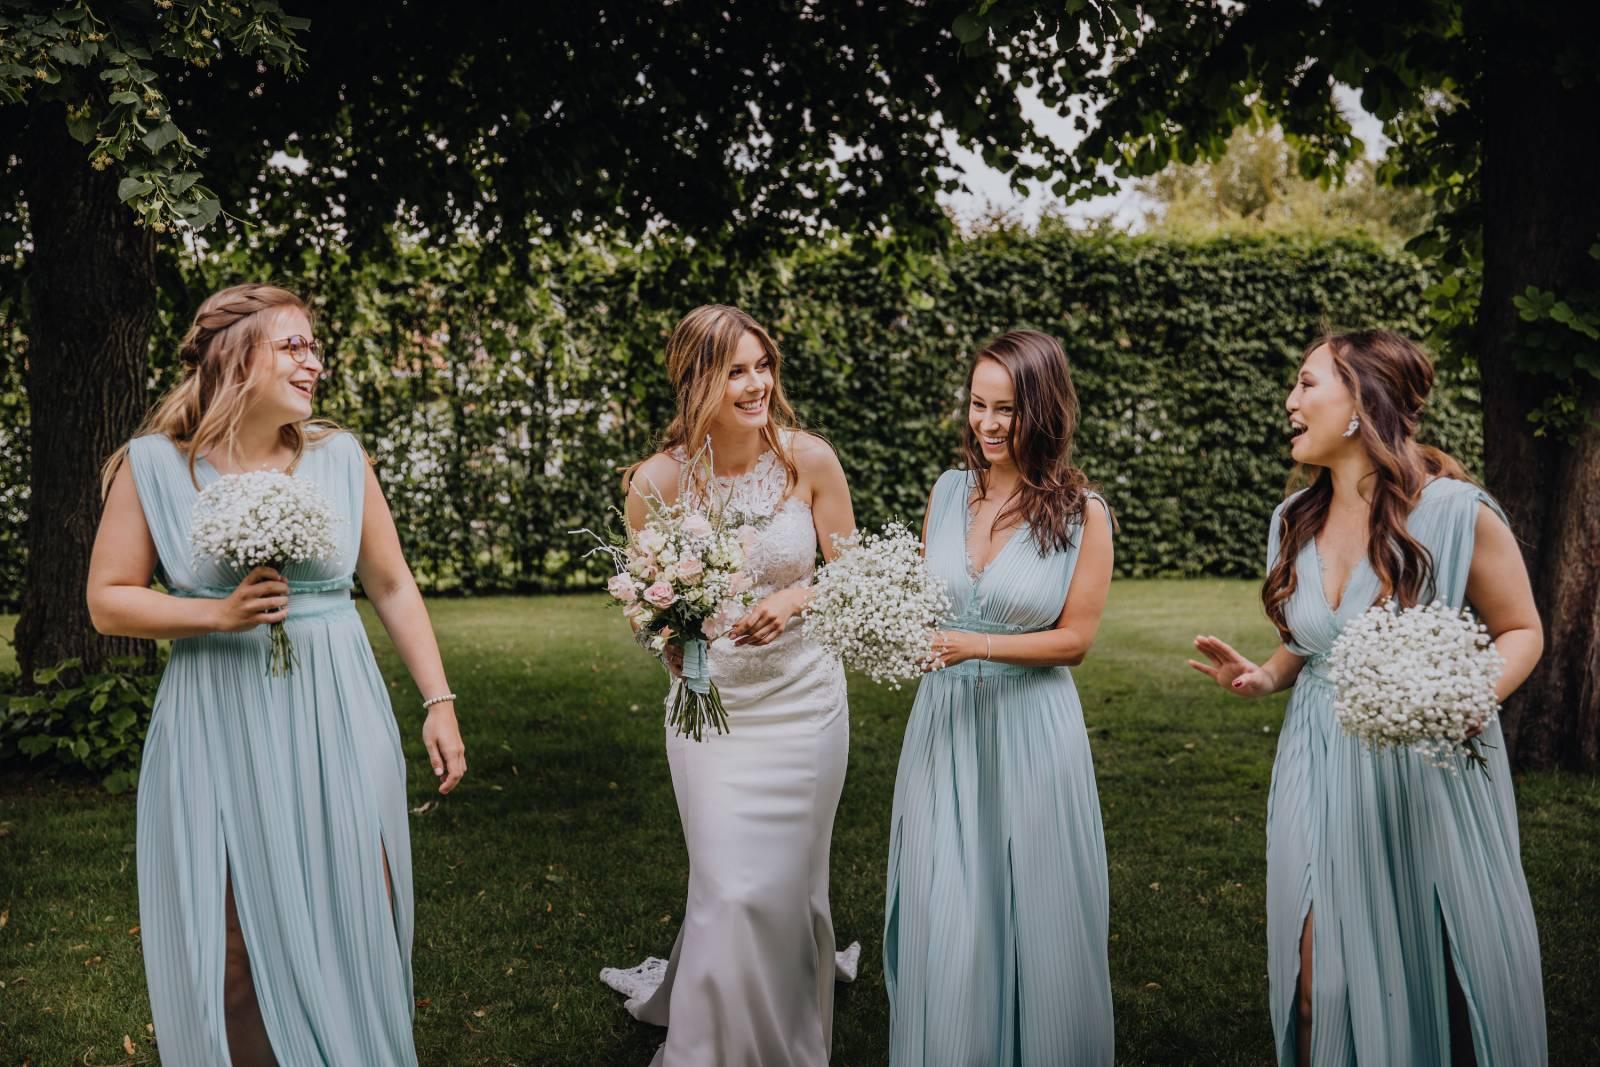 VIVA Blooming - haike - House of Weddings